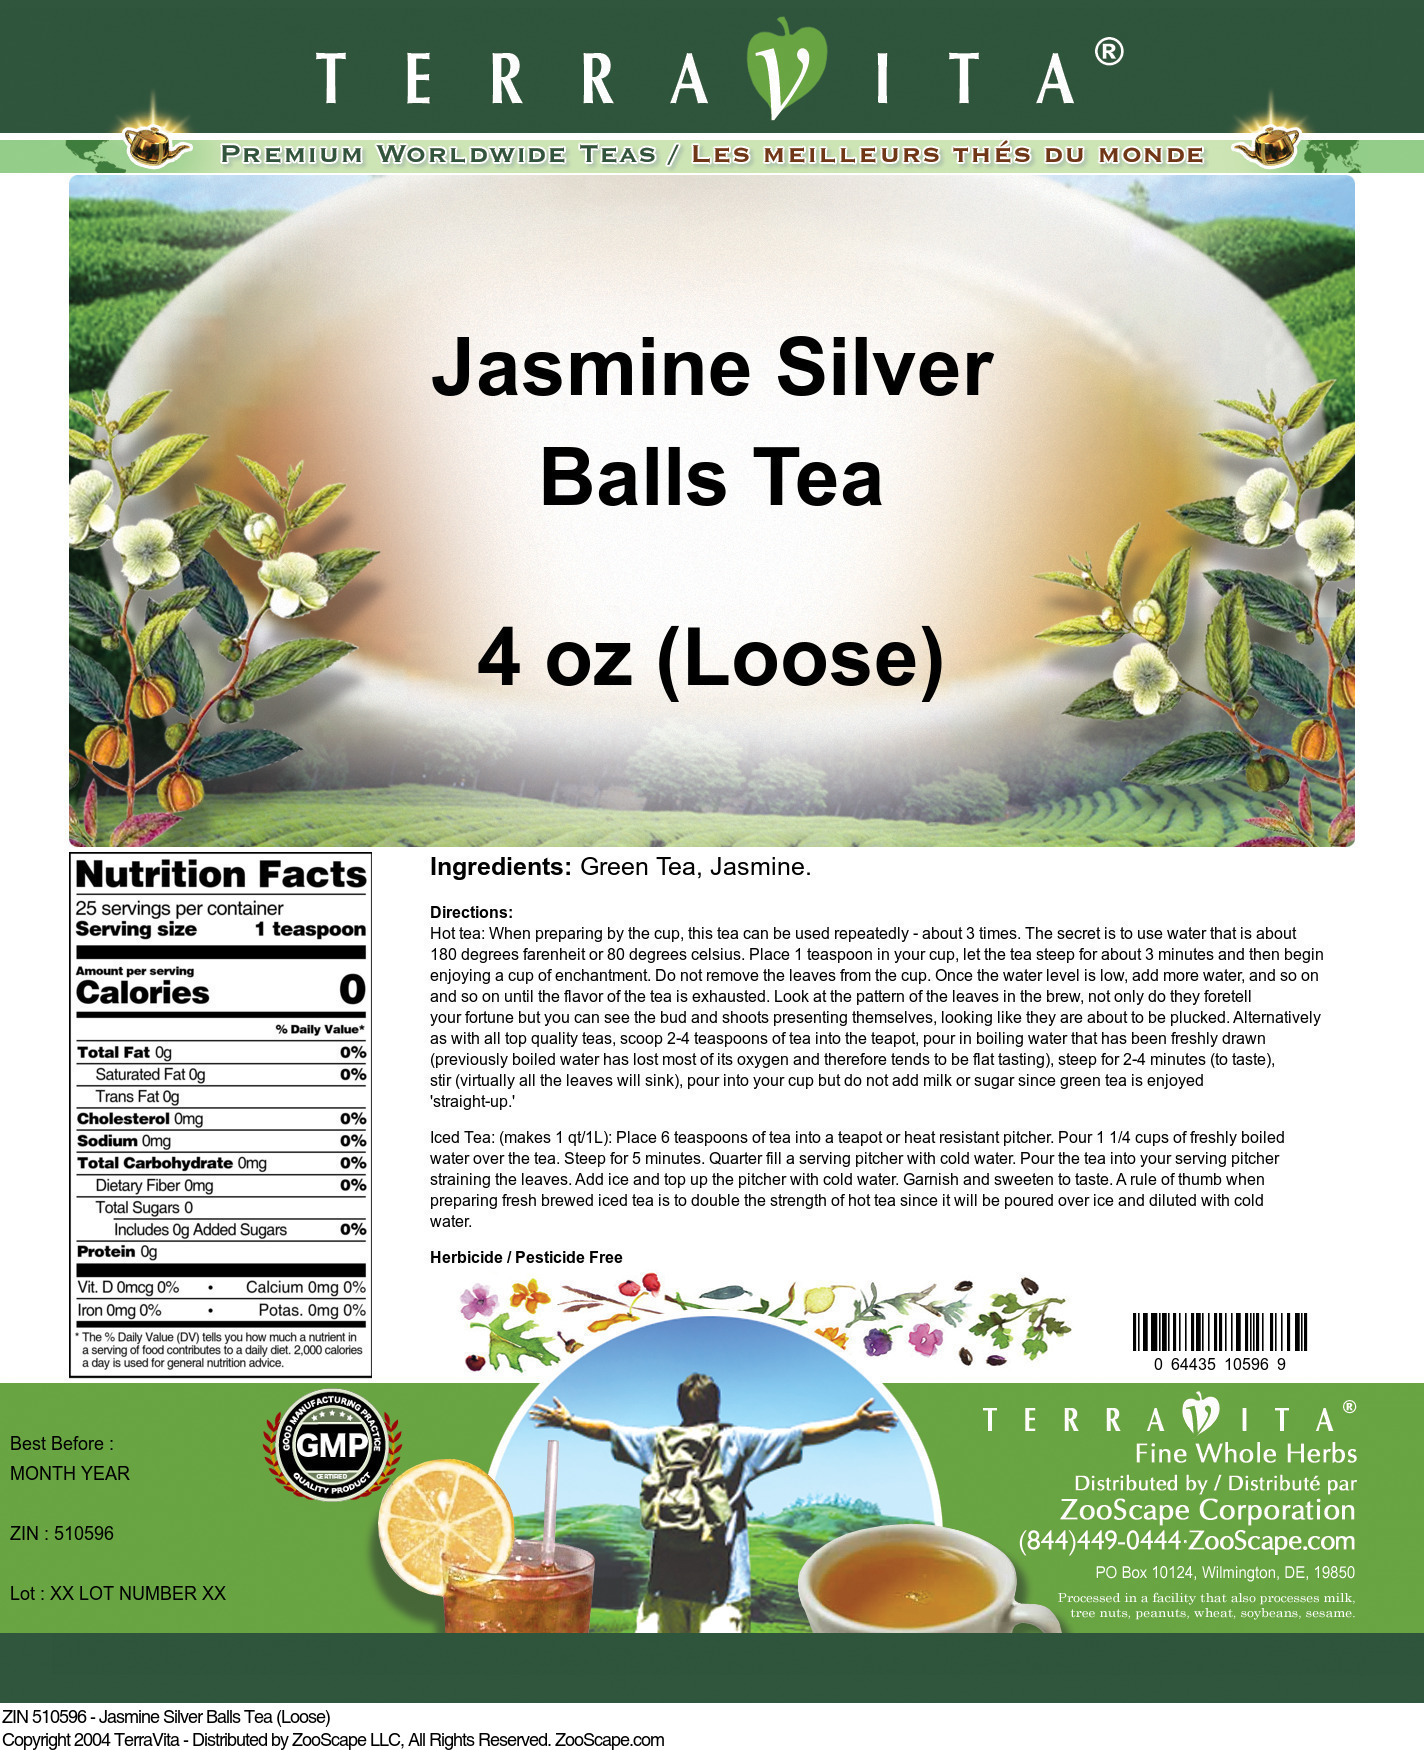 Jasmine Silver Balls Tea (Loose)